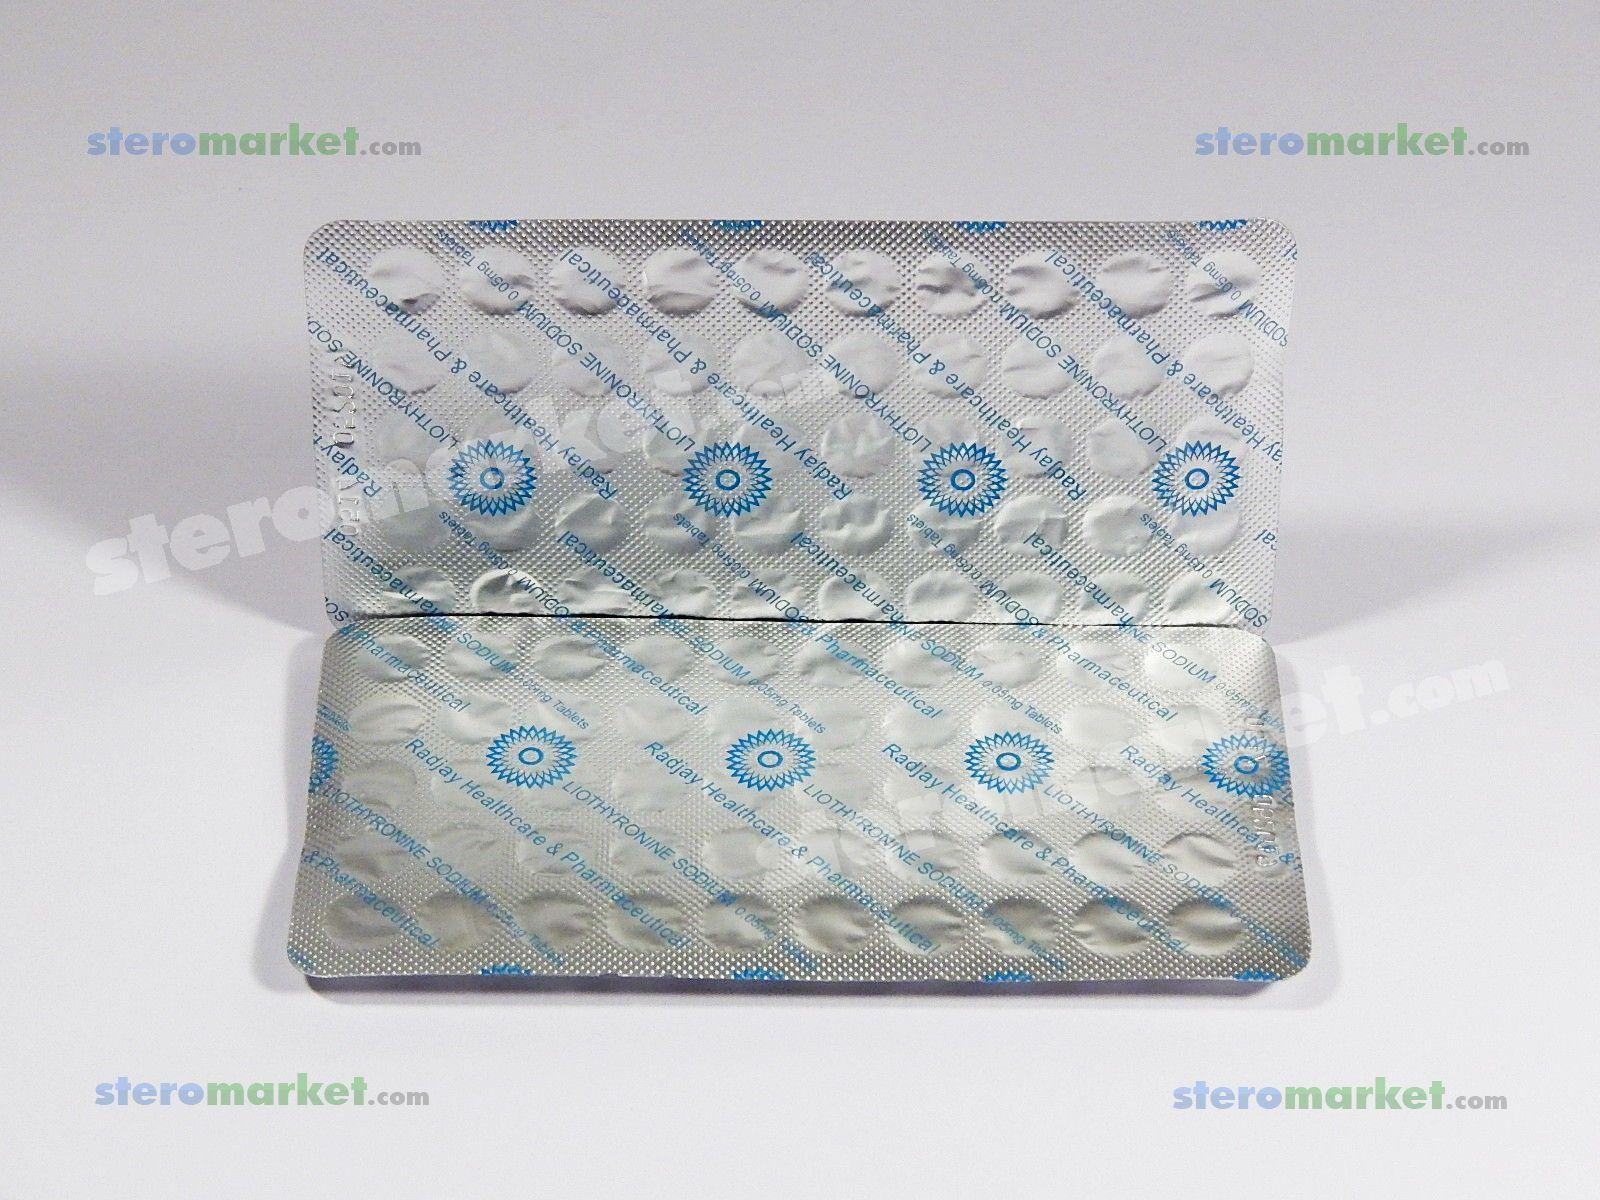 Radjay Liothyronine Sodium 100 tabs Buy Online • USA • for